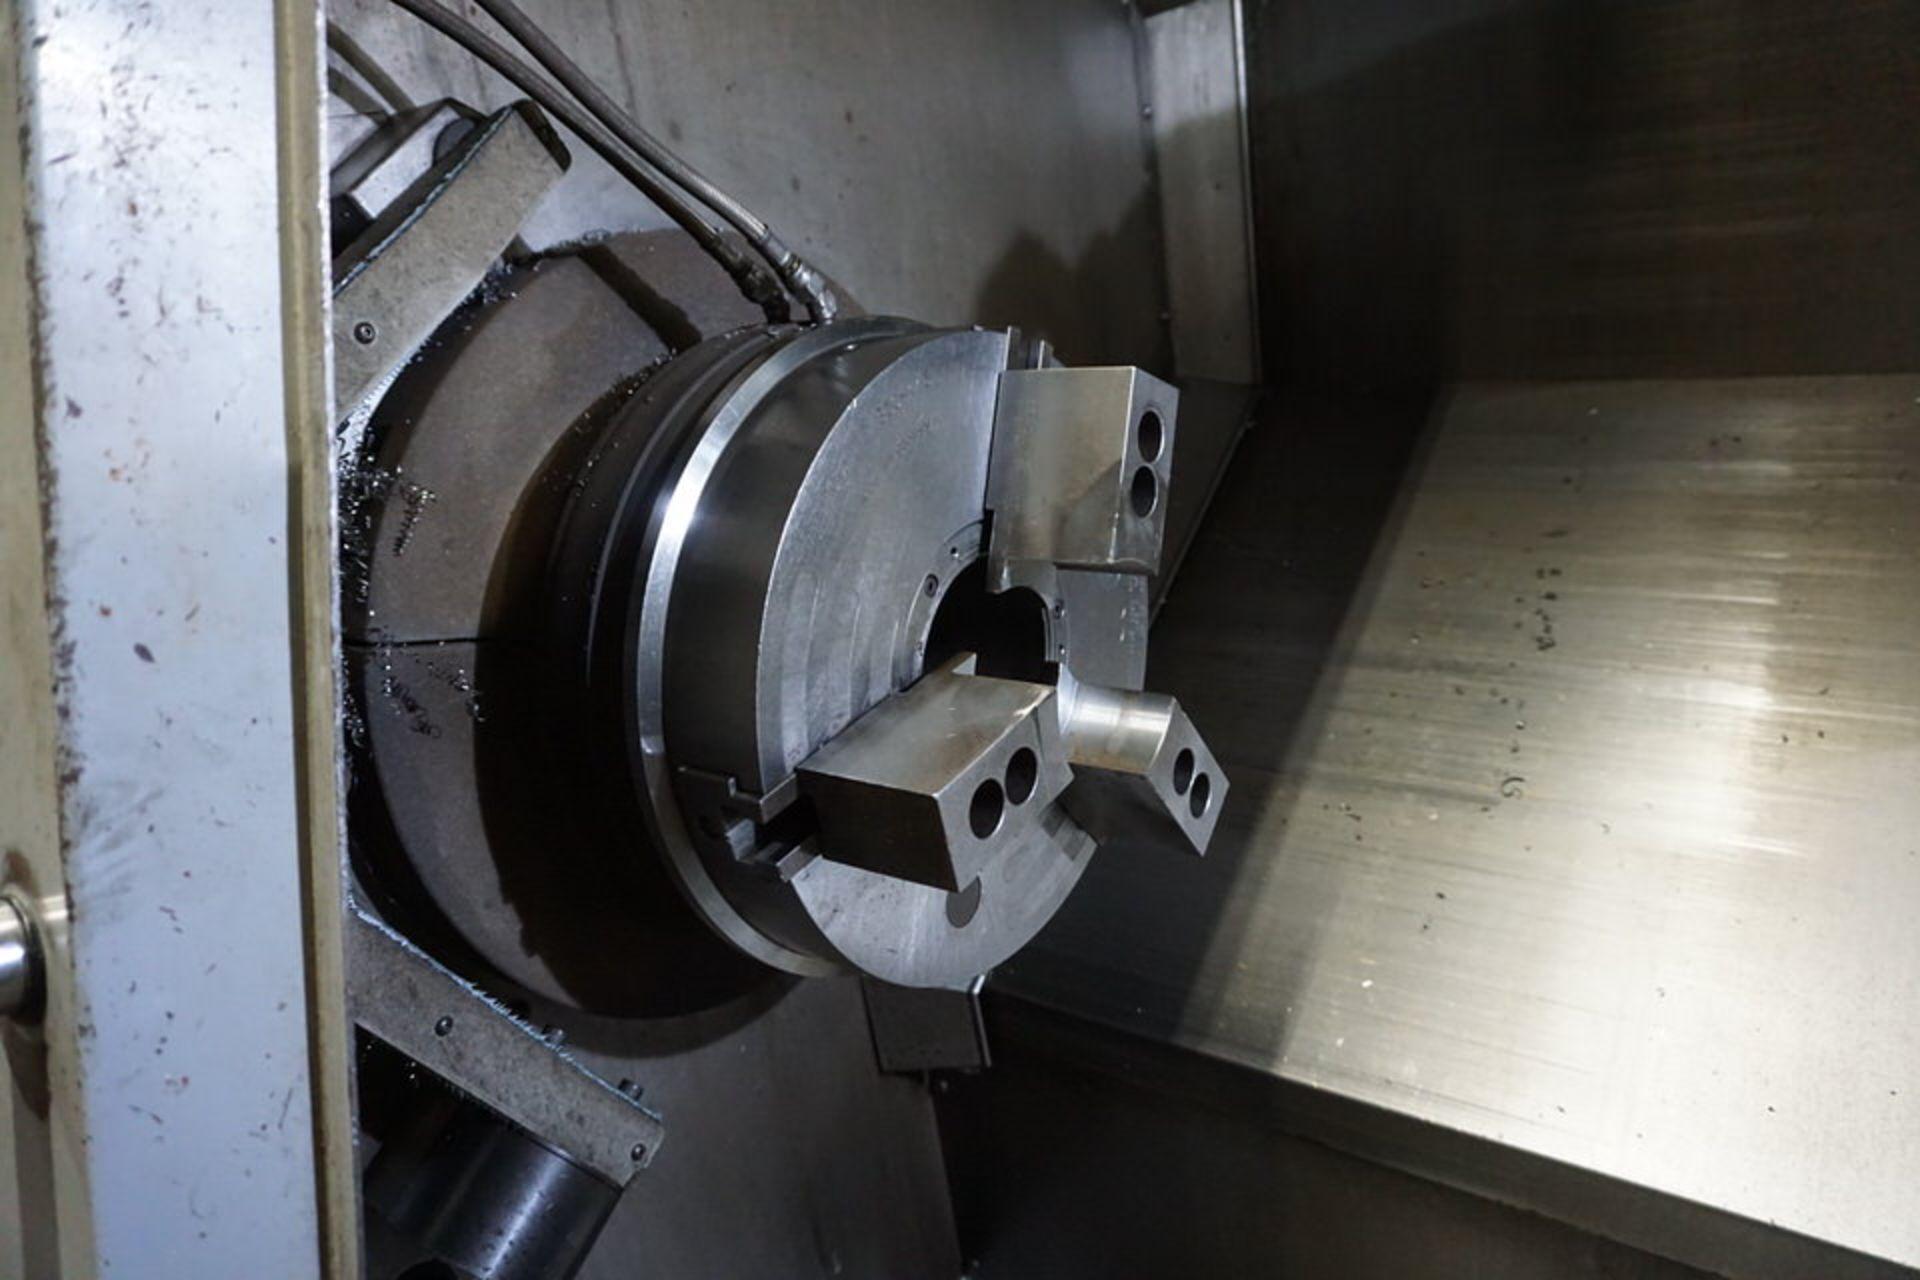 HAAS DOUBLE CHUCK SL-30B CNC LATHE W/ (2) 3 JAW CHUCK, 12 STATION TURRET & HAAS CNC CTRL - Image 3 of 6